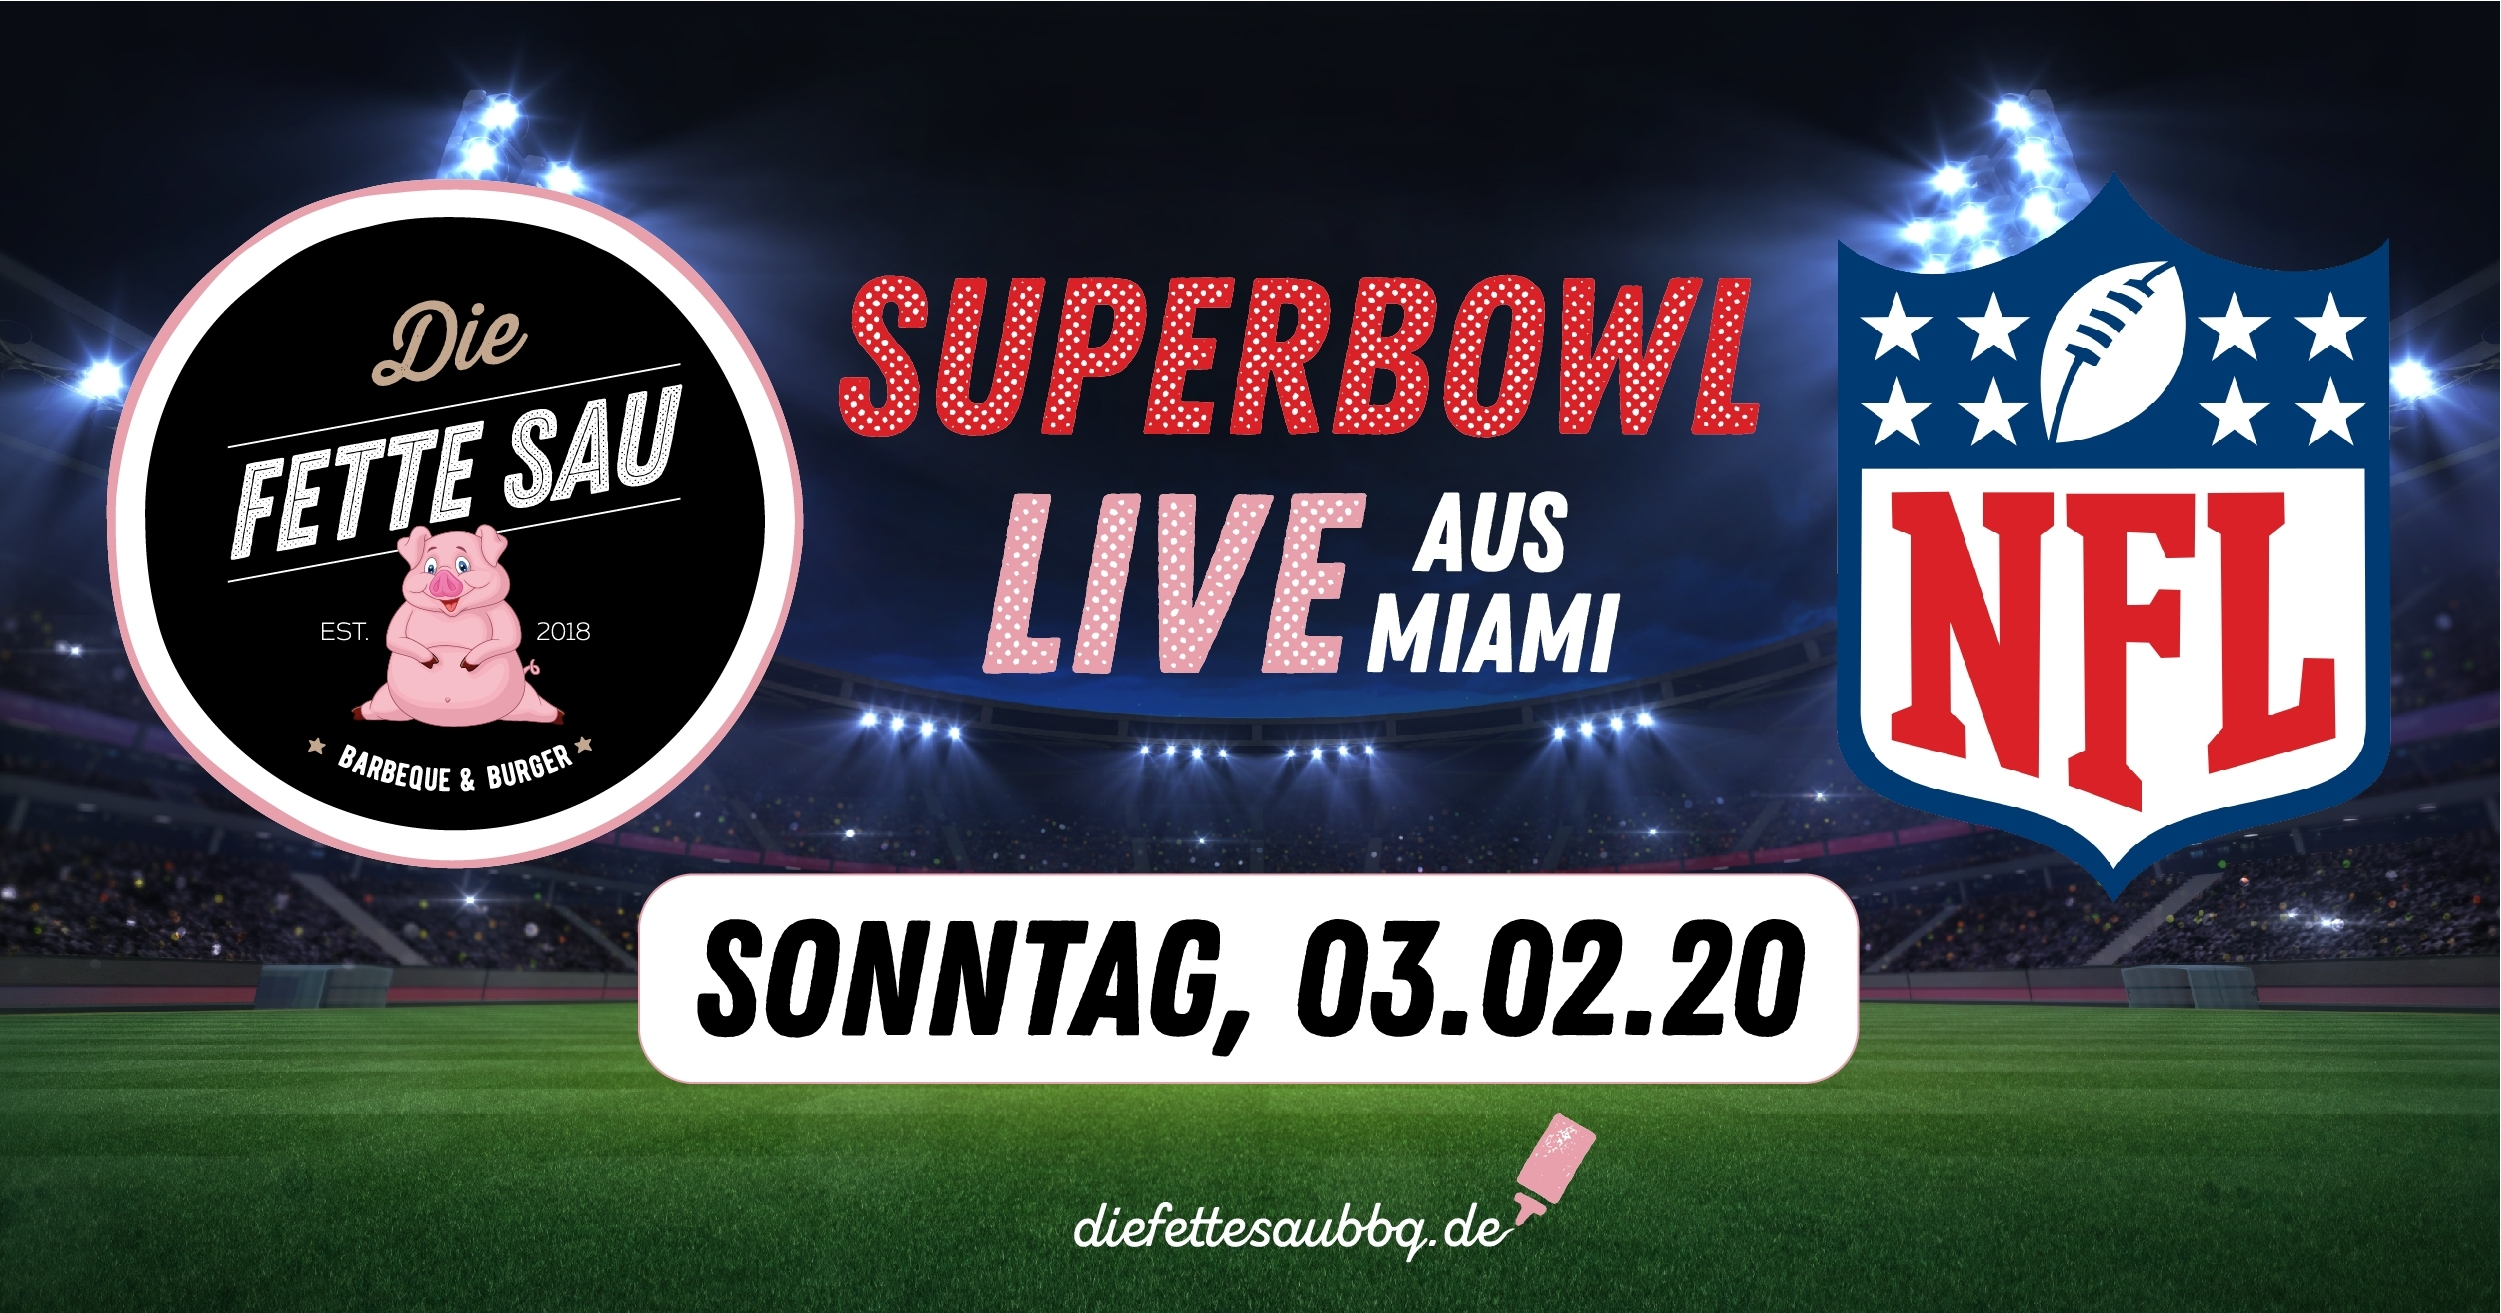 Superbowl 2020 Live Aus Miami! with Super Bowl Time Miami